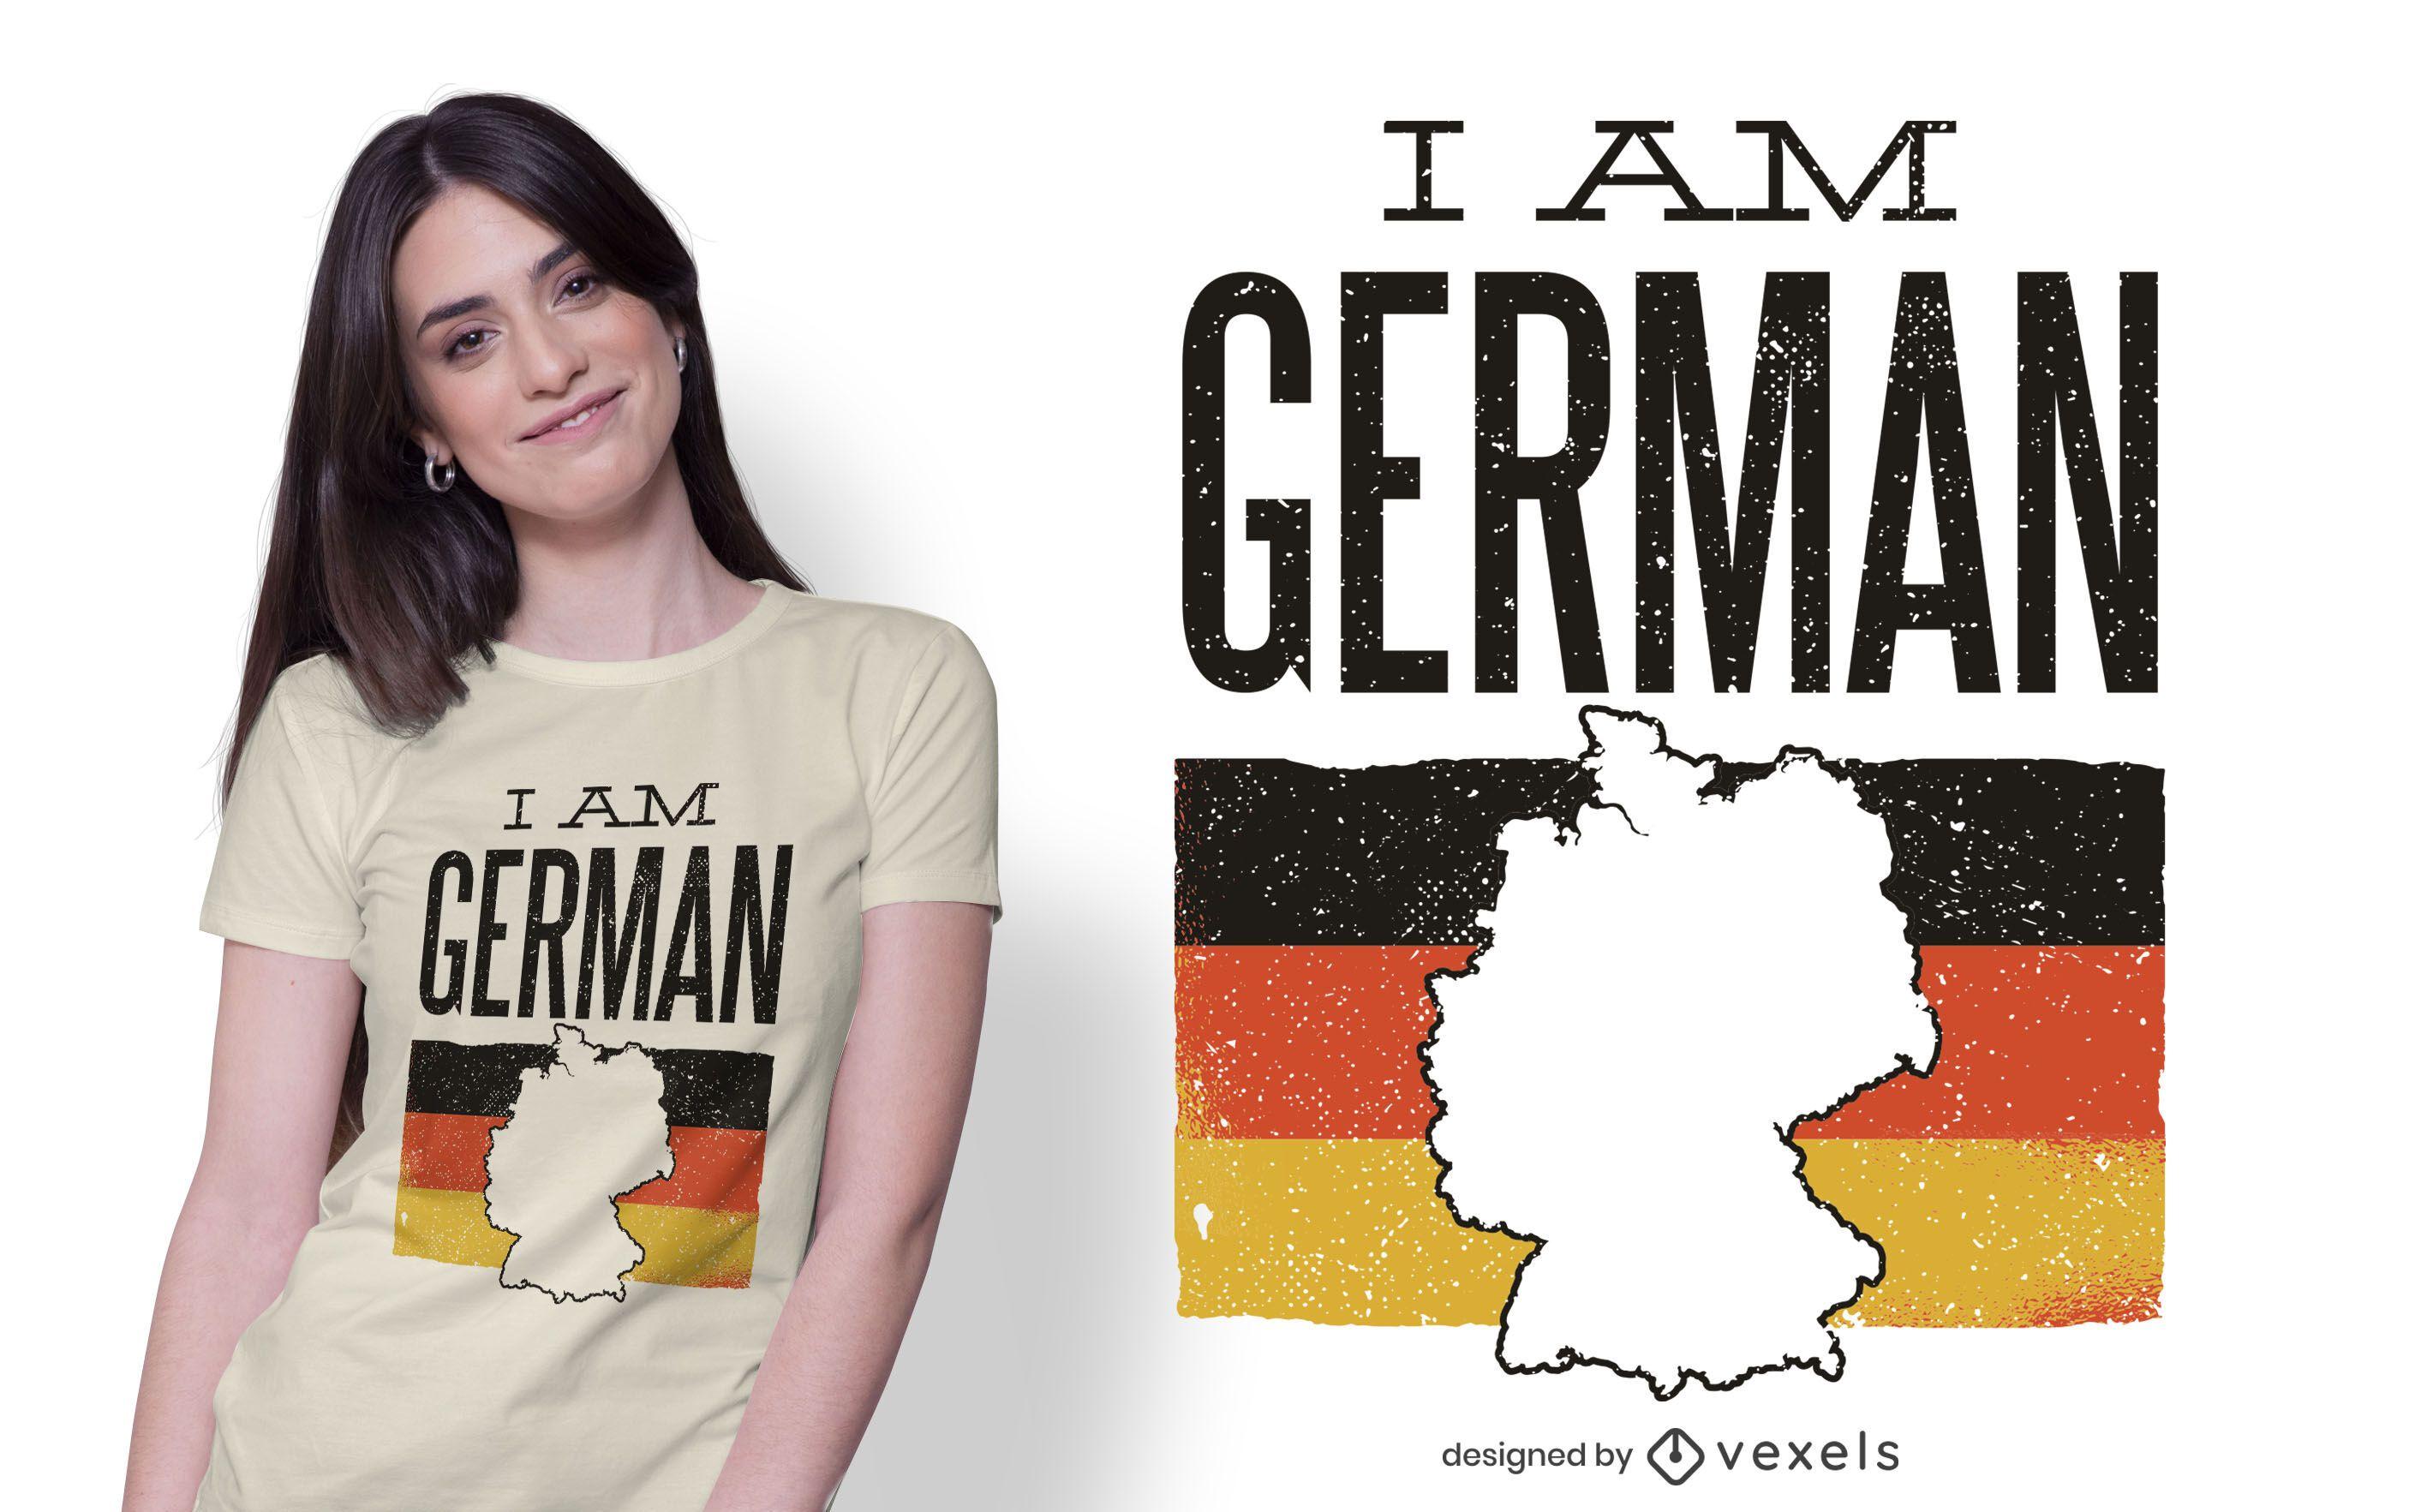 I am german t-shirt design